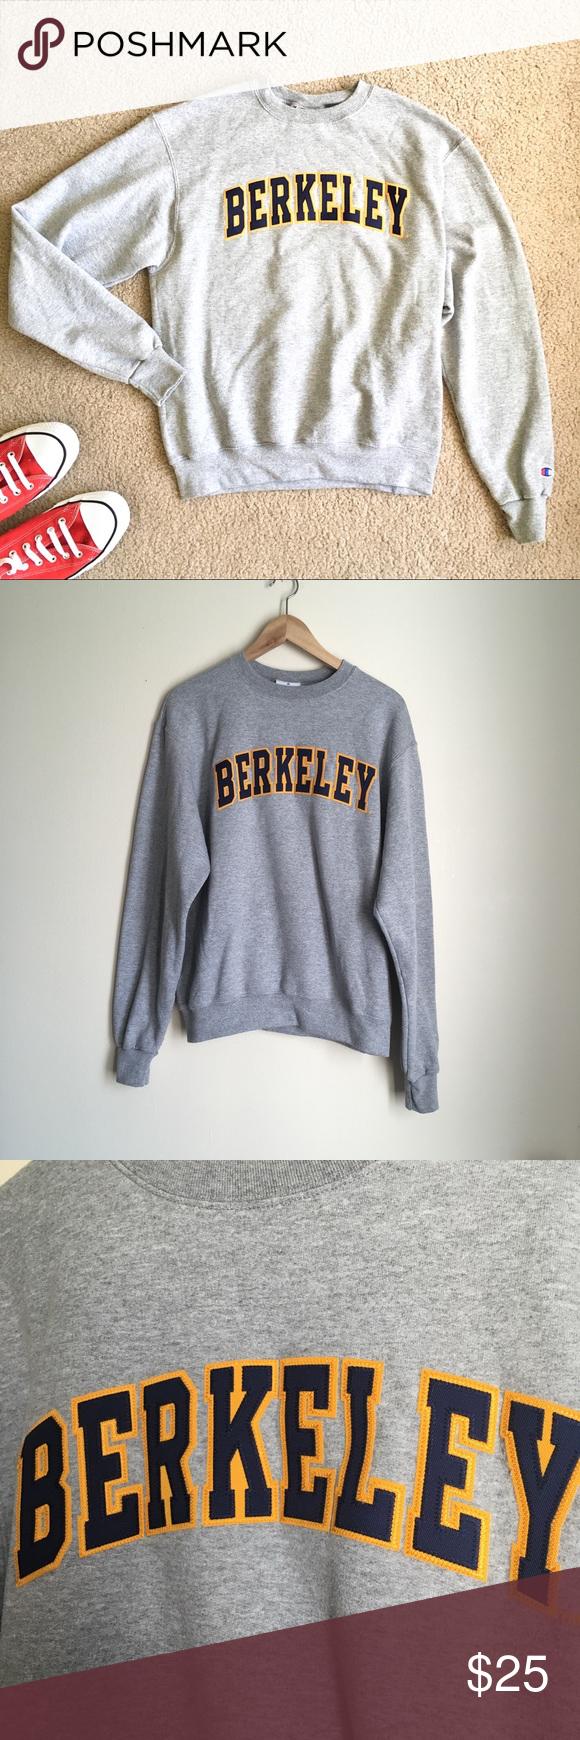 Champion Berkeley Sweatshirt Uc Gray Letters Grey Sweatshirt Sweatshirts Sweatshirt Tops [ 1740 x 580 Pixel ]